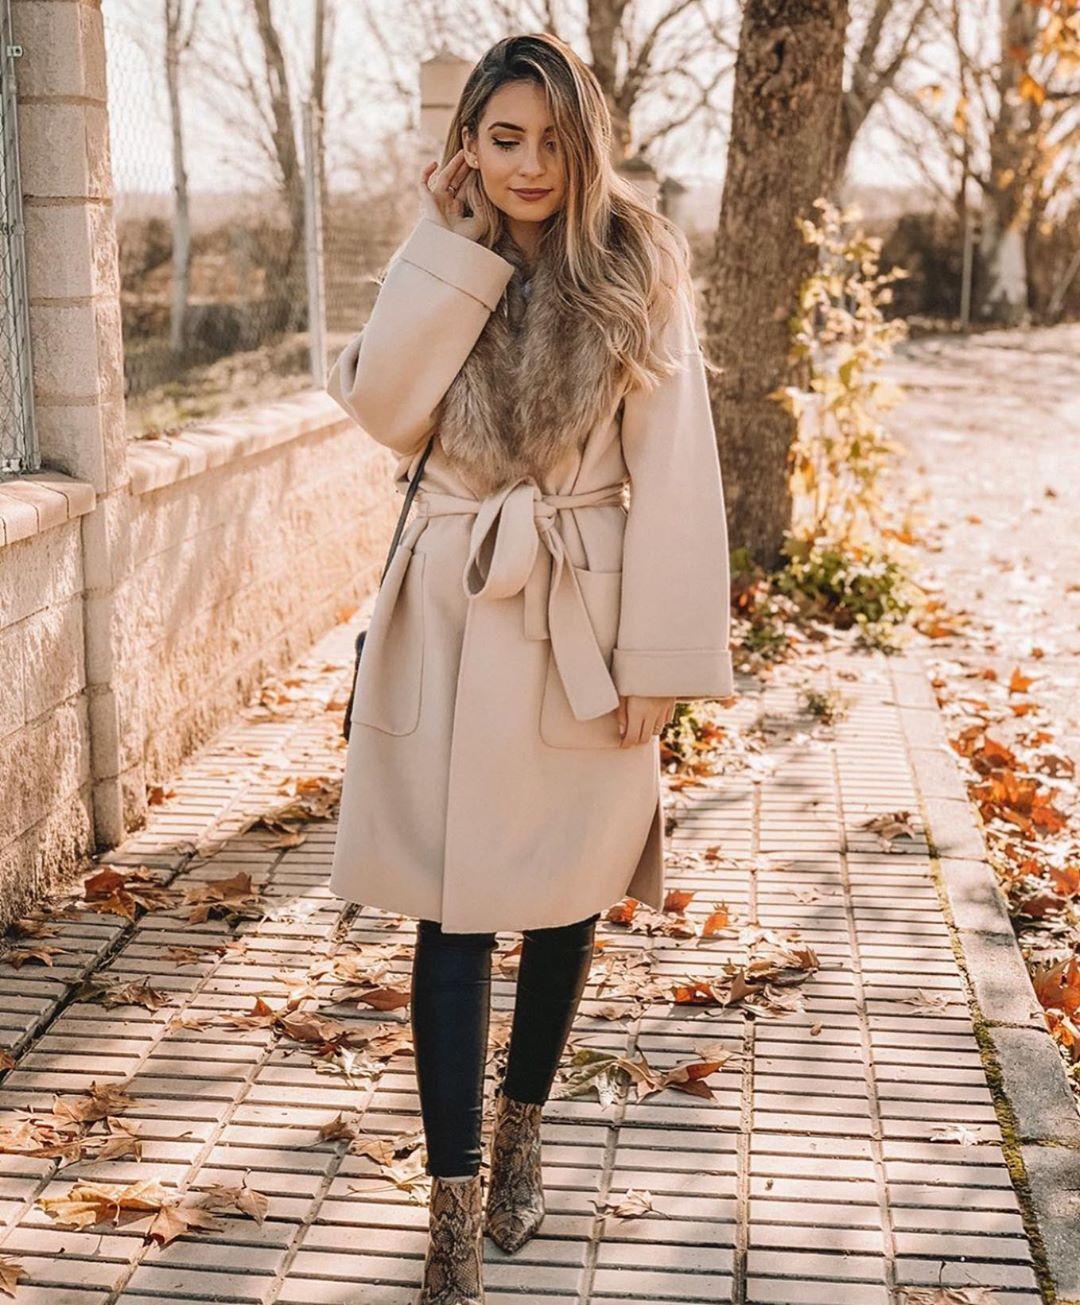 manteau à col effet fourrure de Zara sur zara.outfits